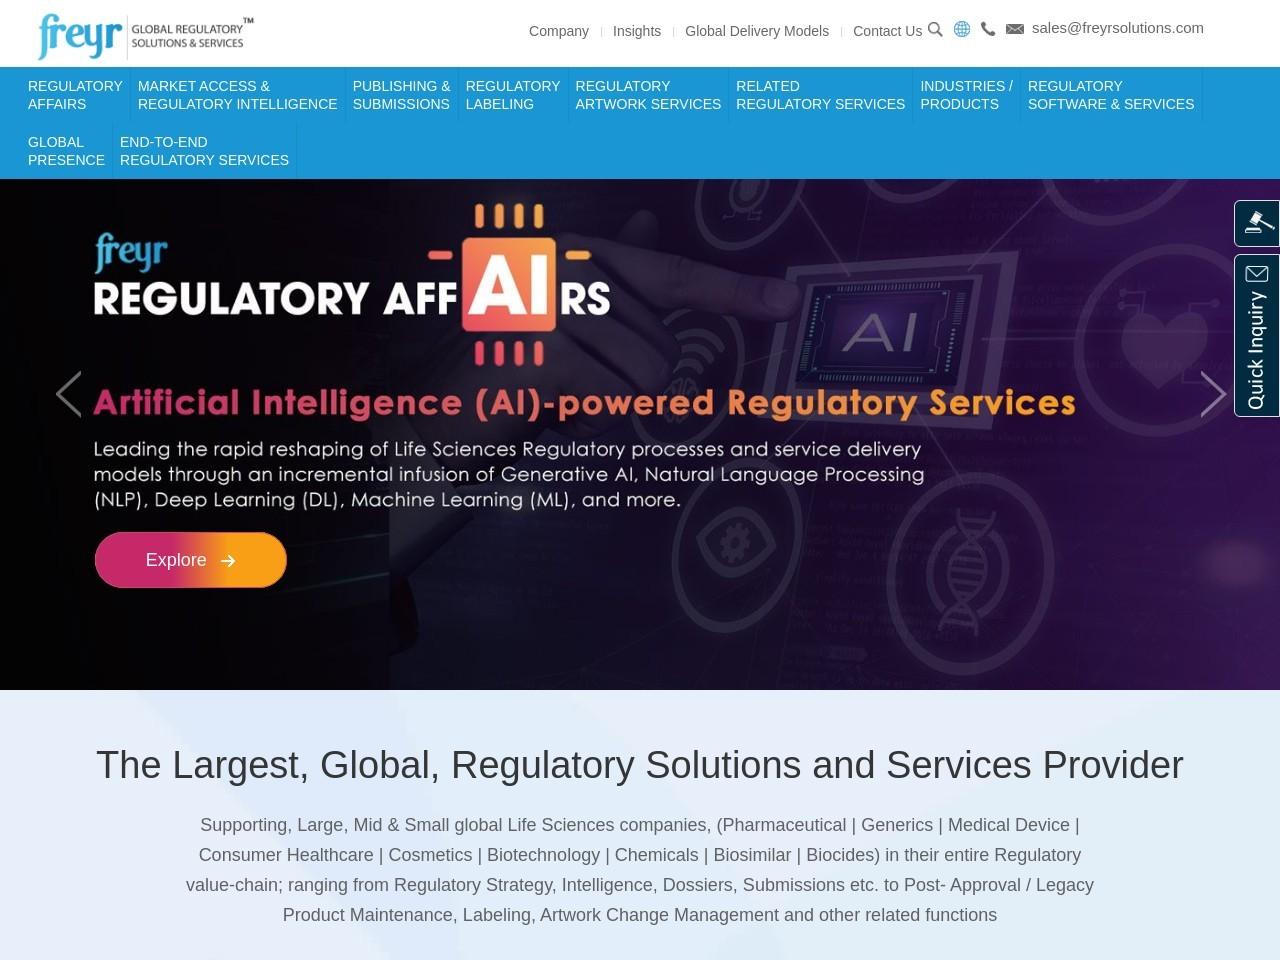 Neonatal Resuscitation Table Registration/Notification in USA, US FDA, Covid-19